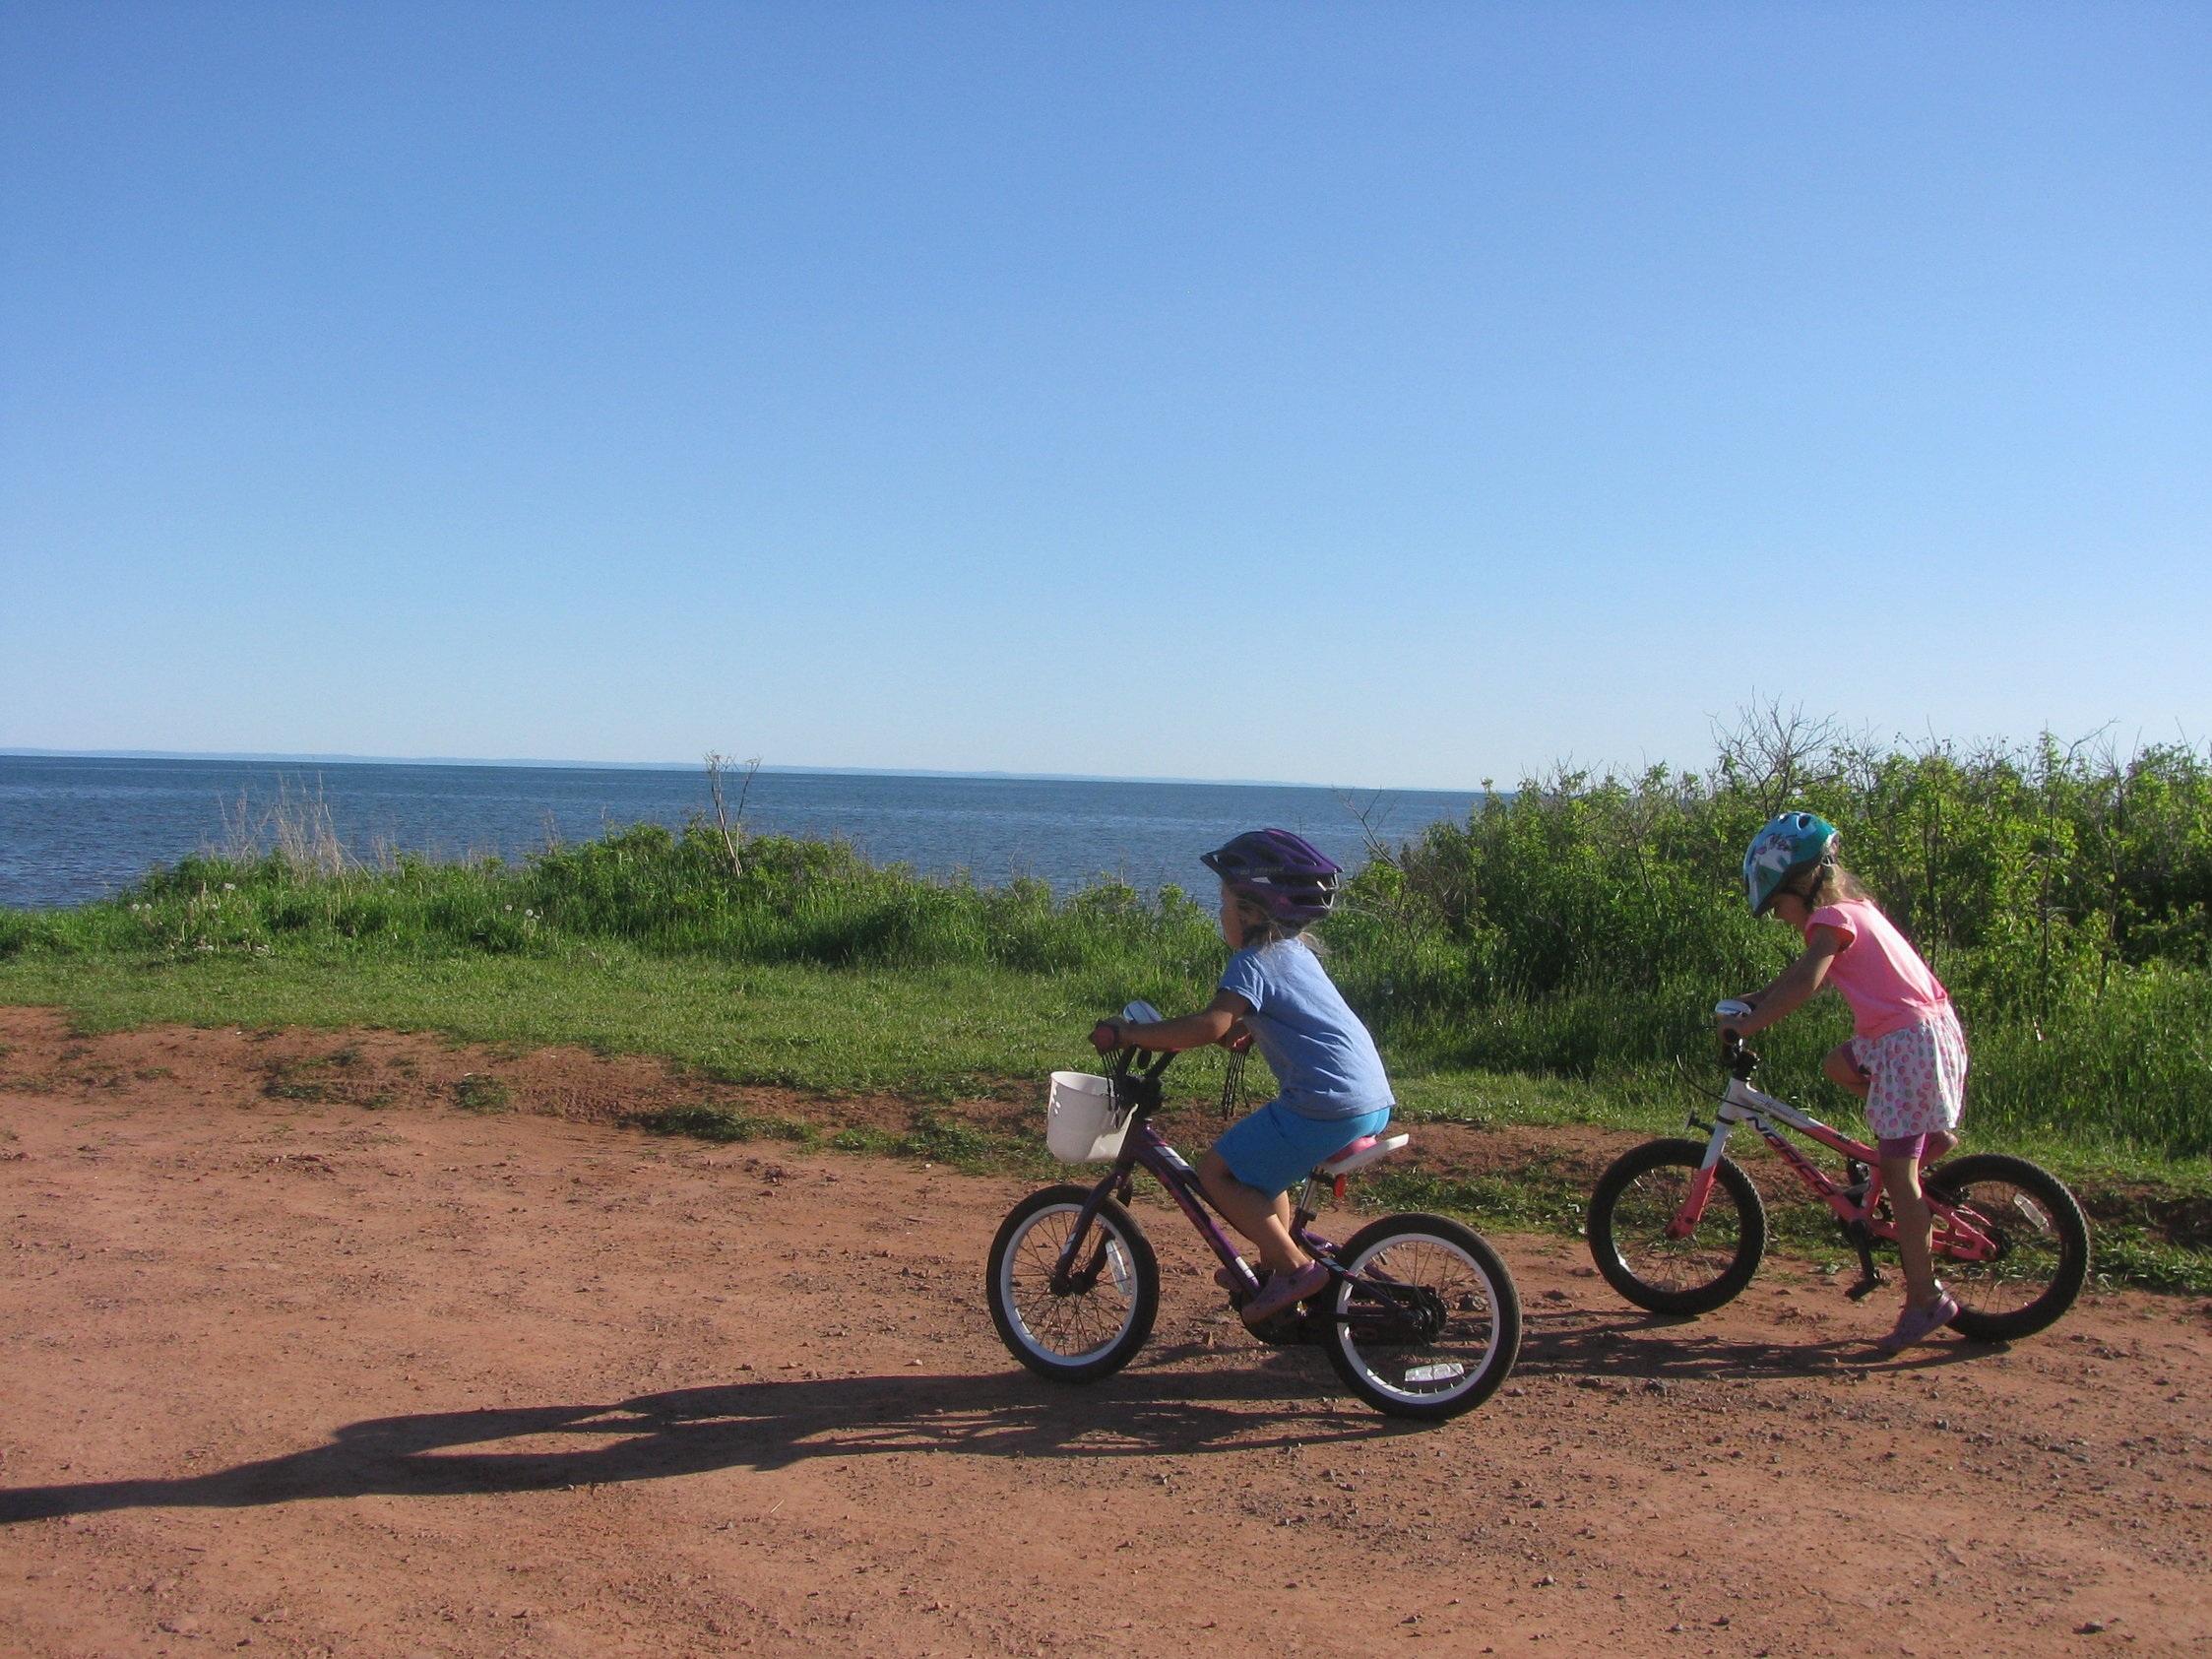 Biking to the beach.